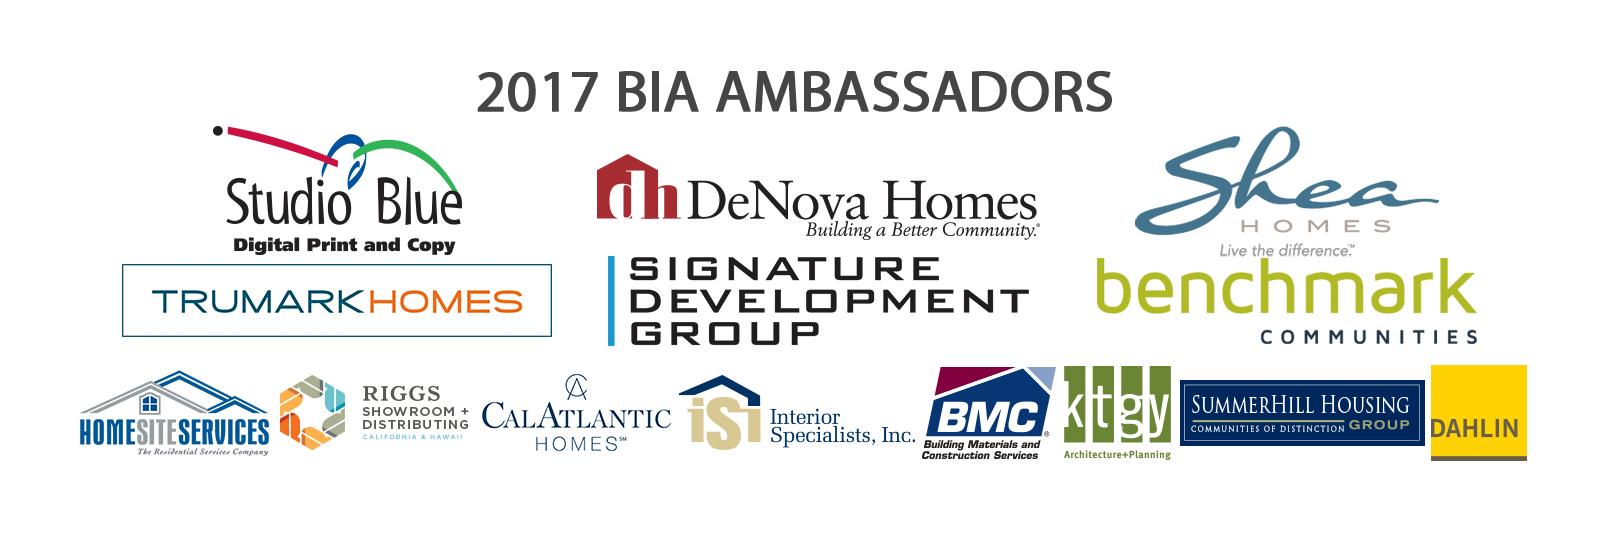 2017-Ambassador-Banner-Website-Title.jpg